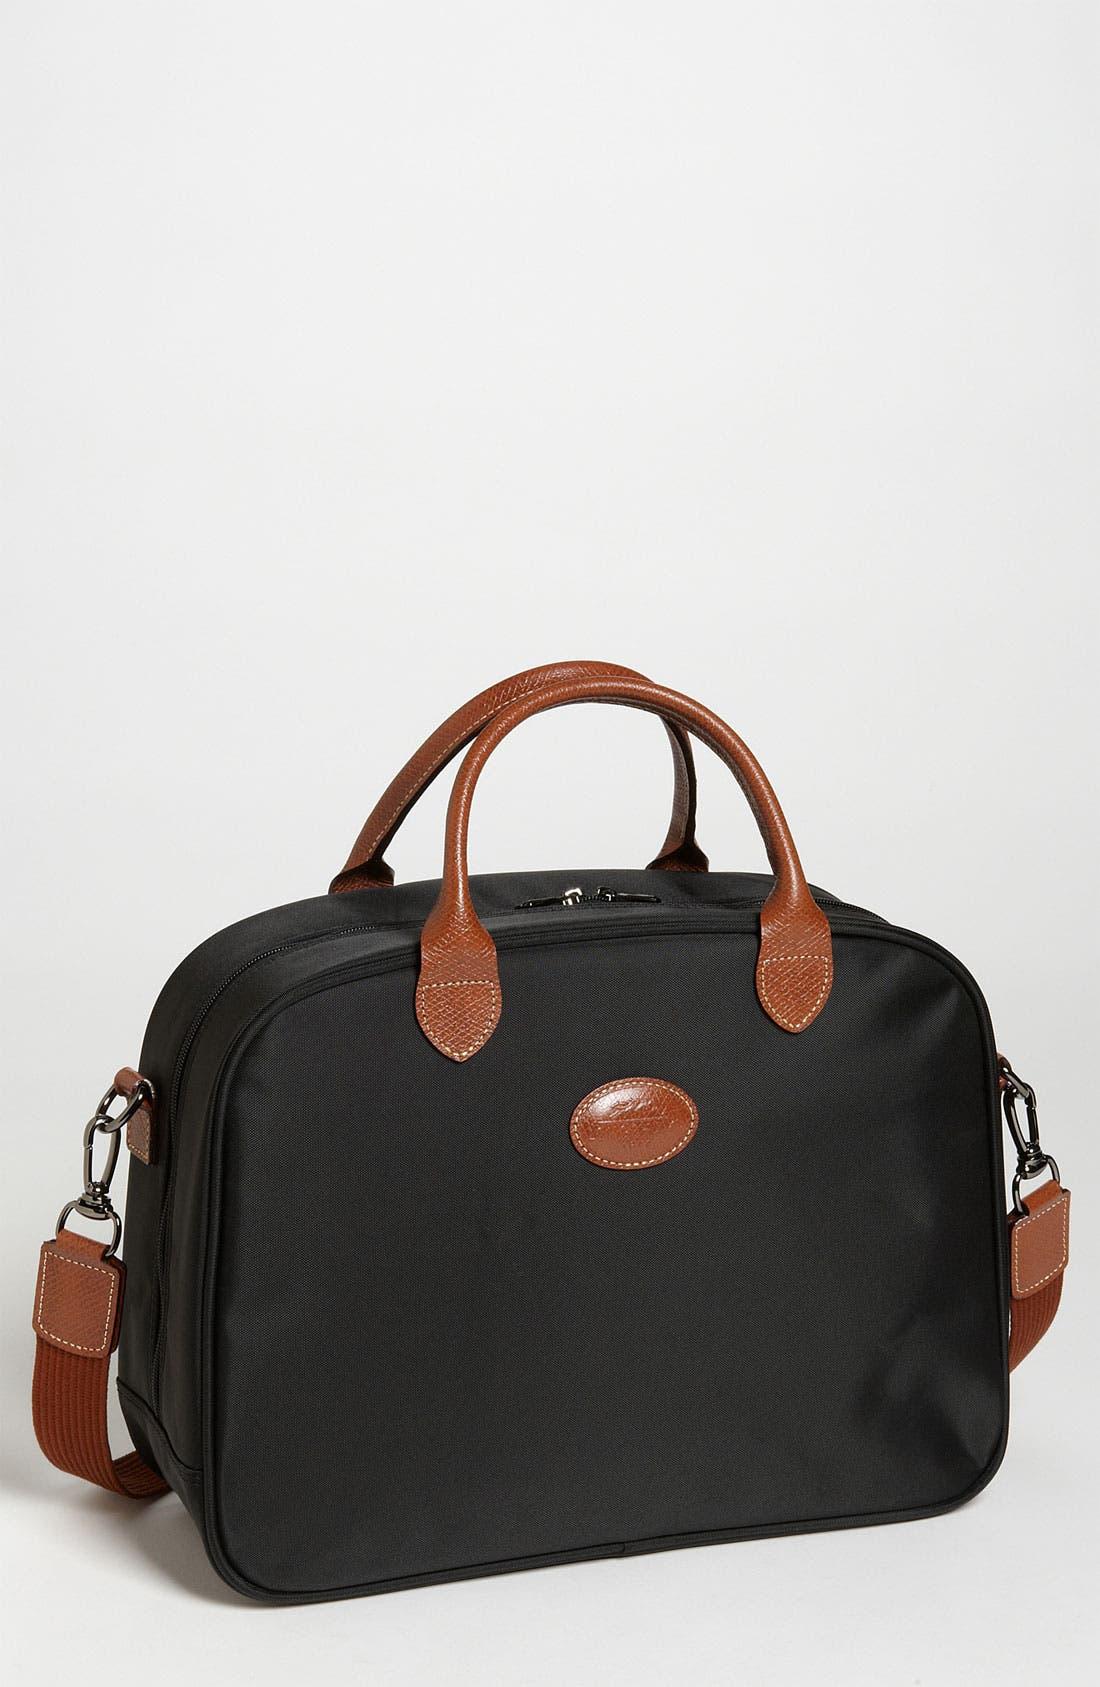 Alternate Image 1 Selected - Longchamp 'Le Pliage' Travel Bag